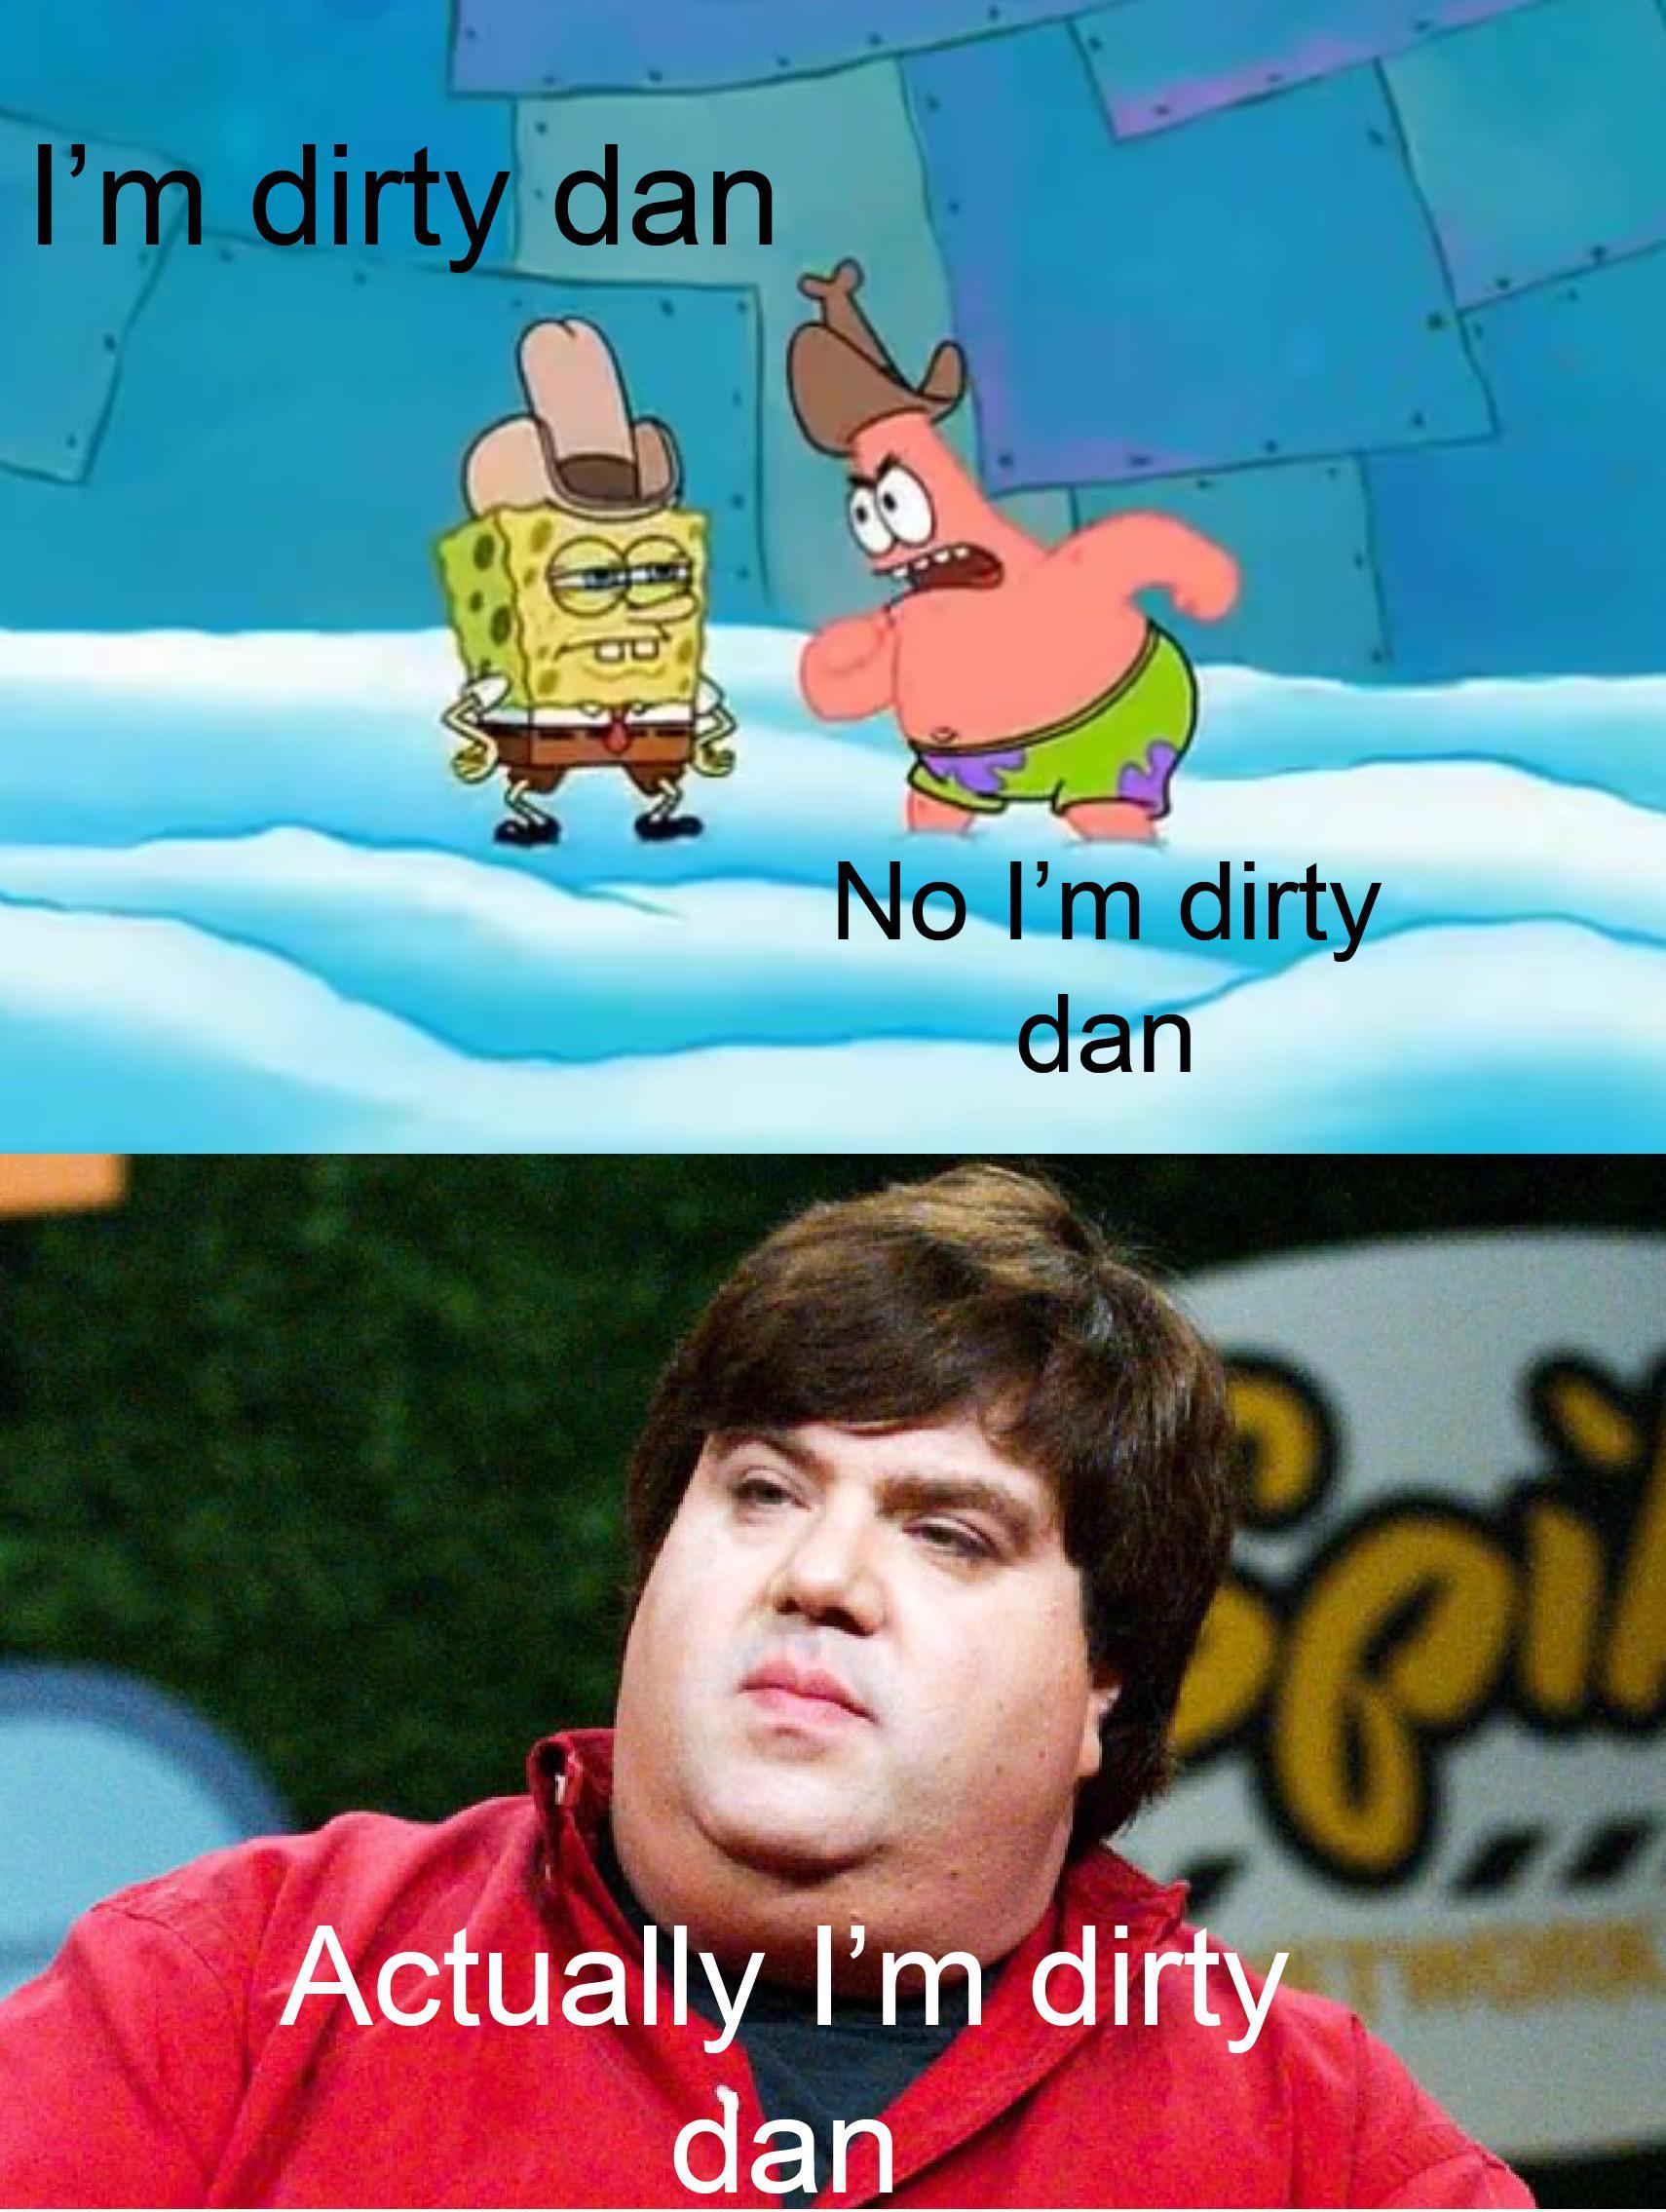 Spongebob Dirty Dan : spongebob, dirty, Dirty, R/BikiniBottomTwitter, SpongeBob, SquarePants